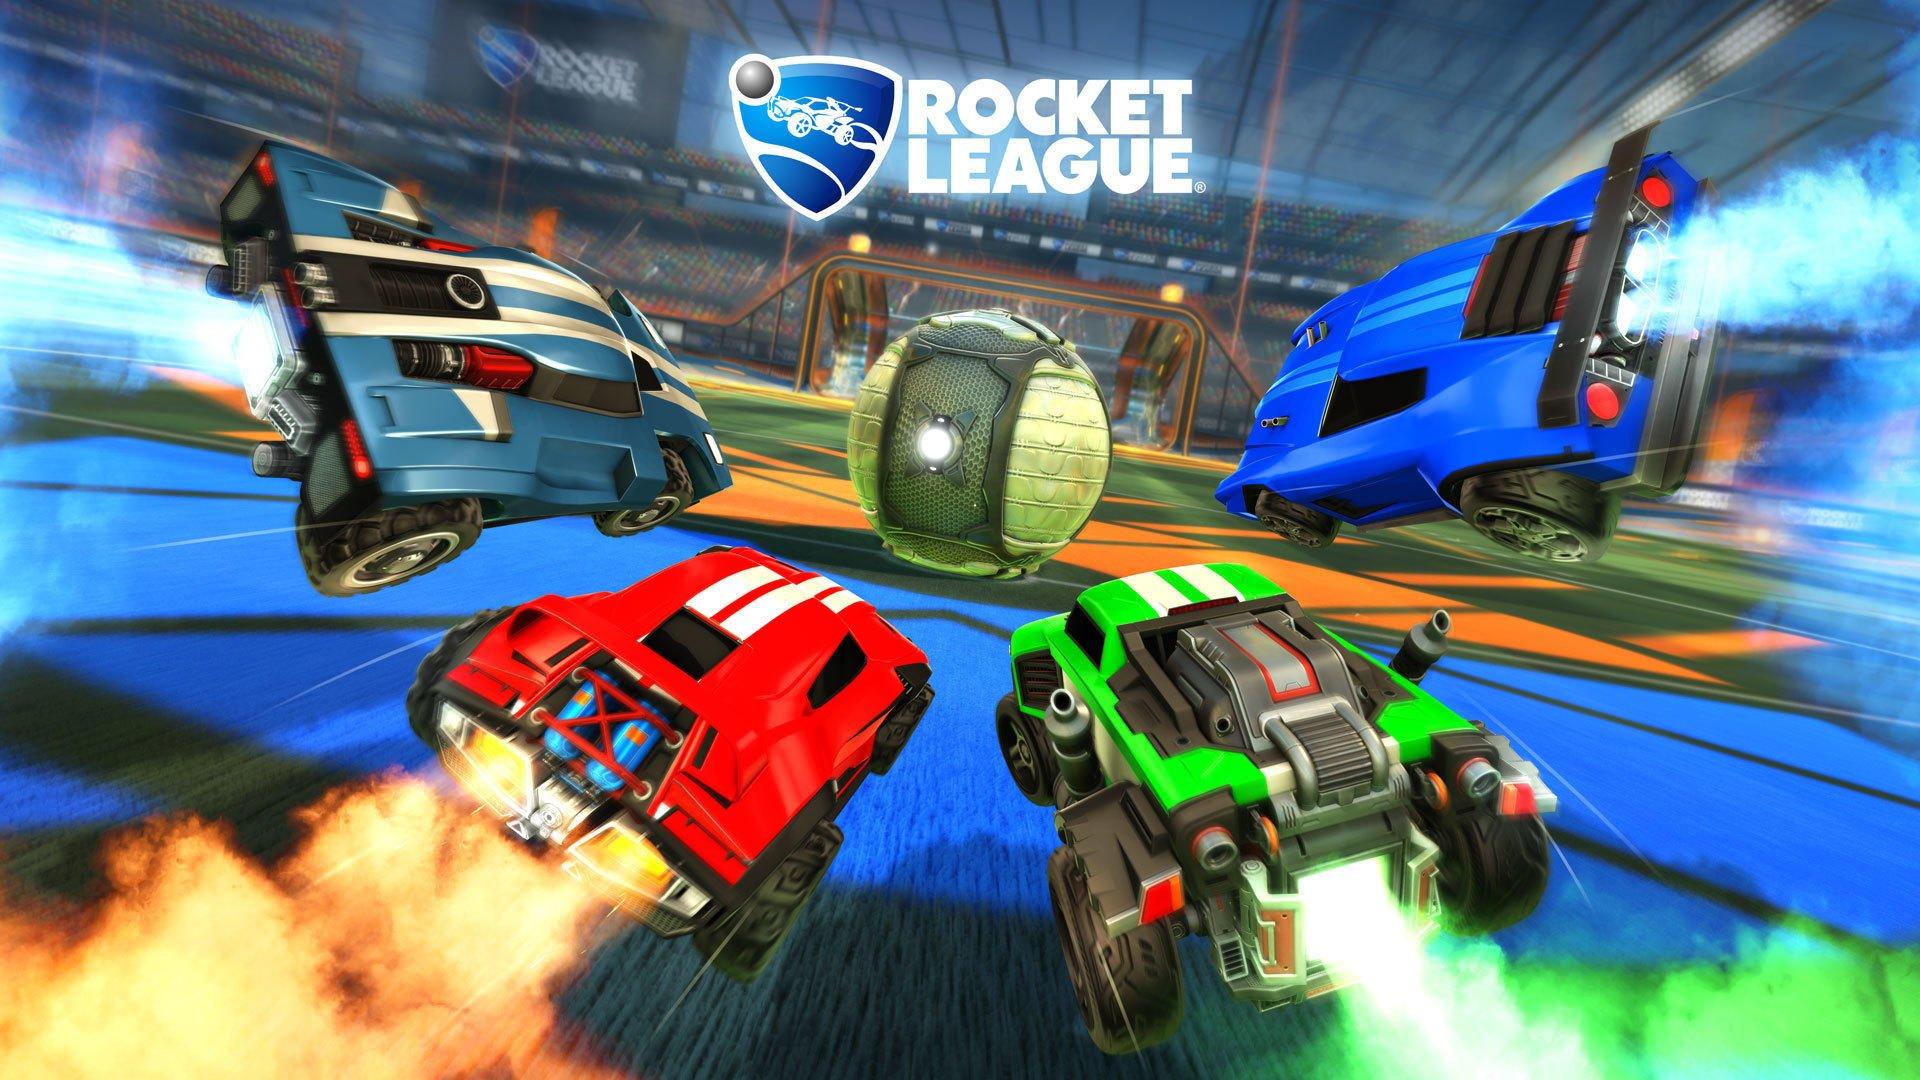 Are Rocket League Servers Down?